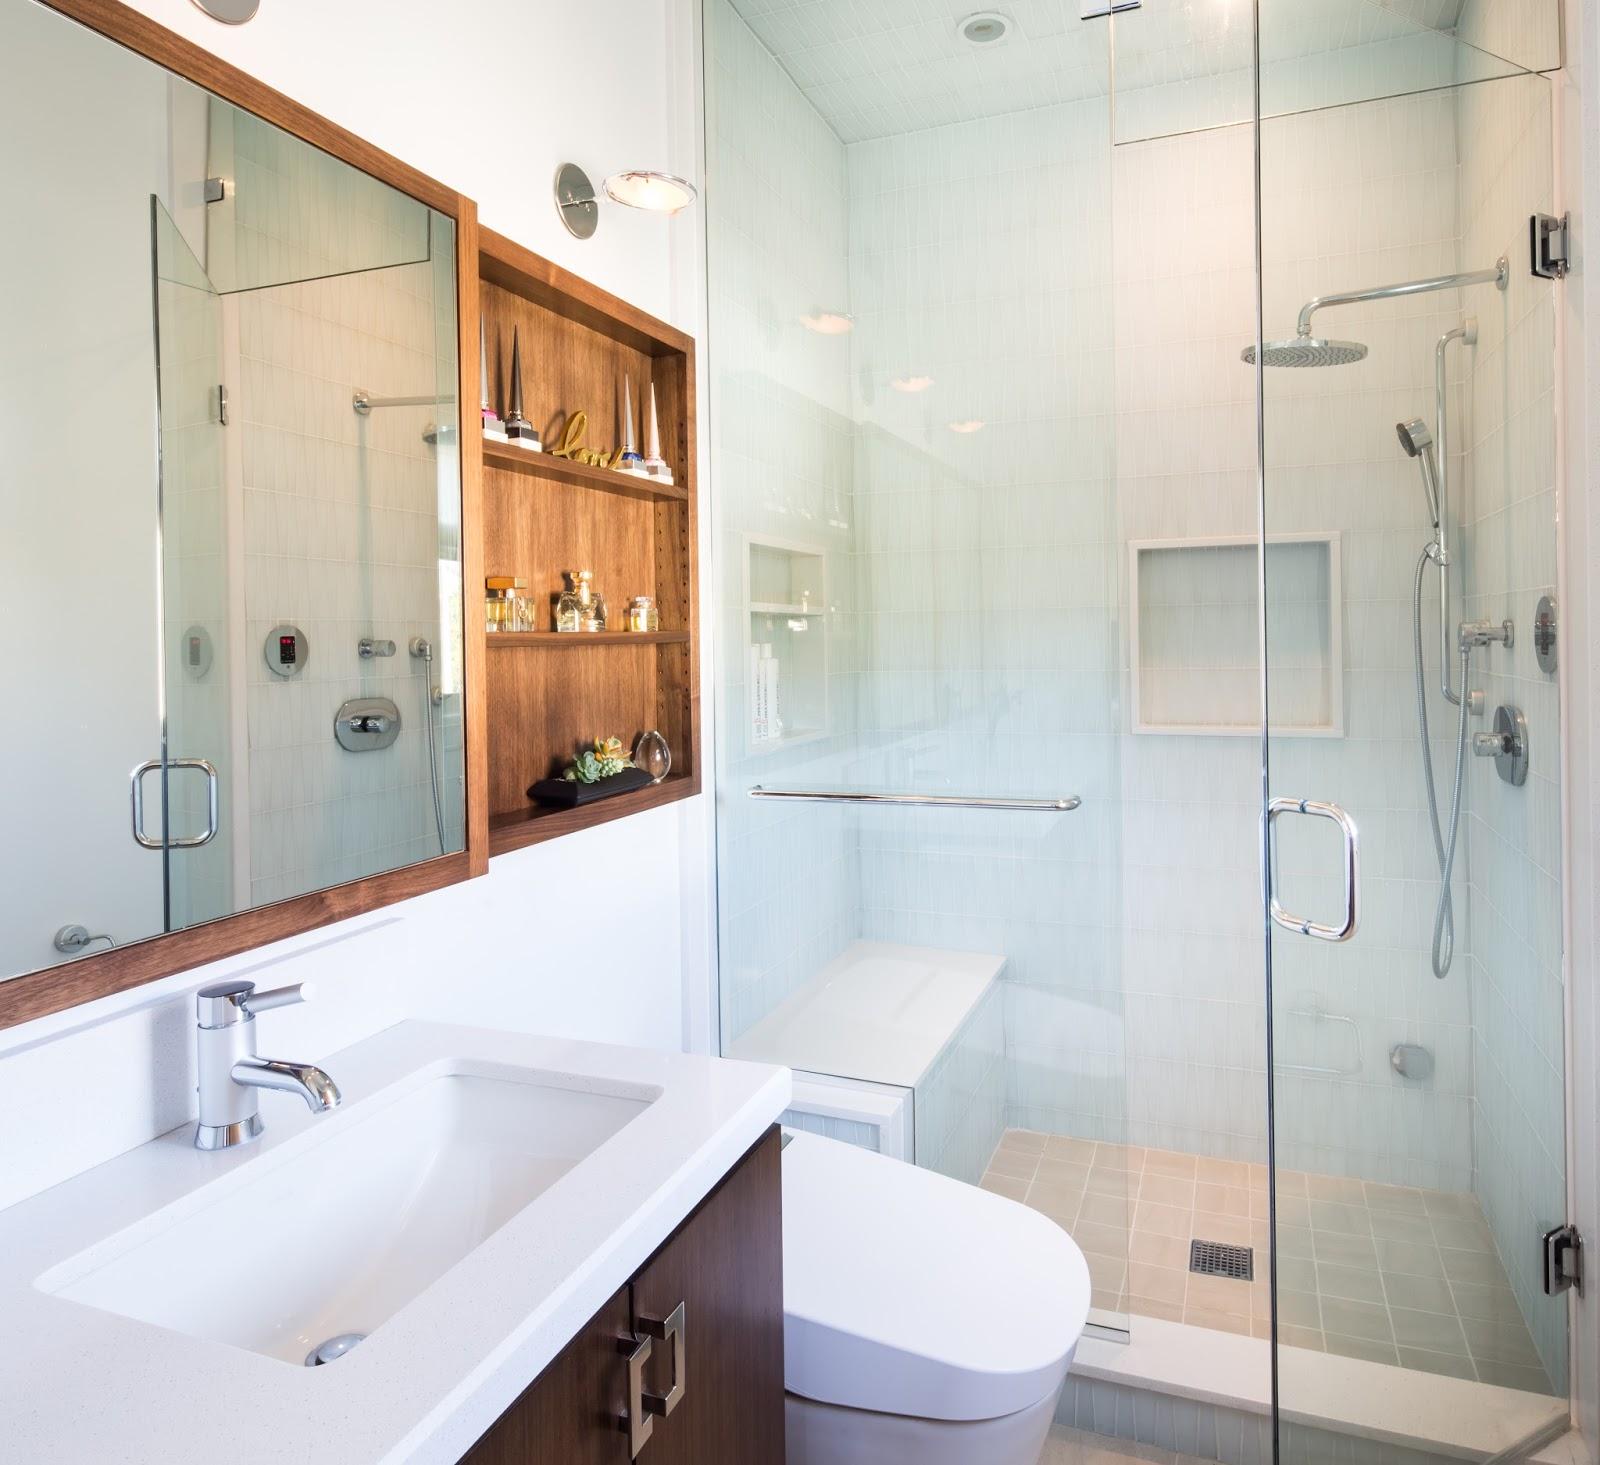 EMI Interior Design, Inc: The HOME SPA Experience